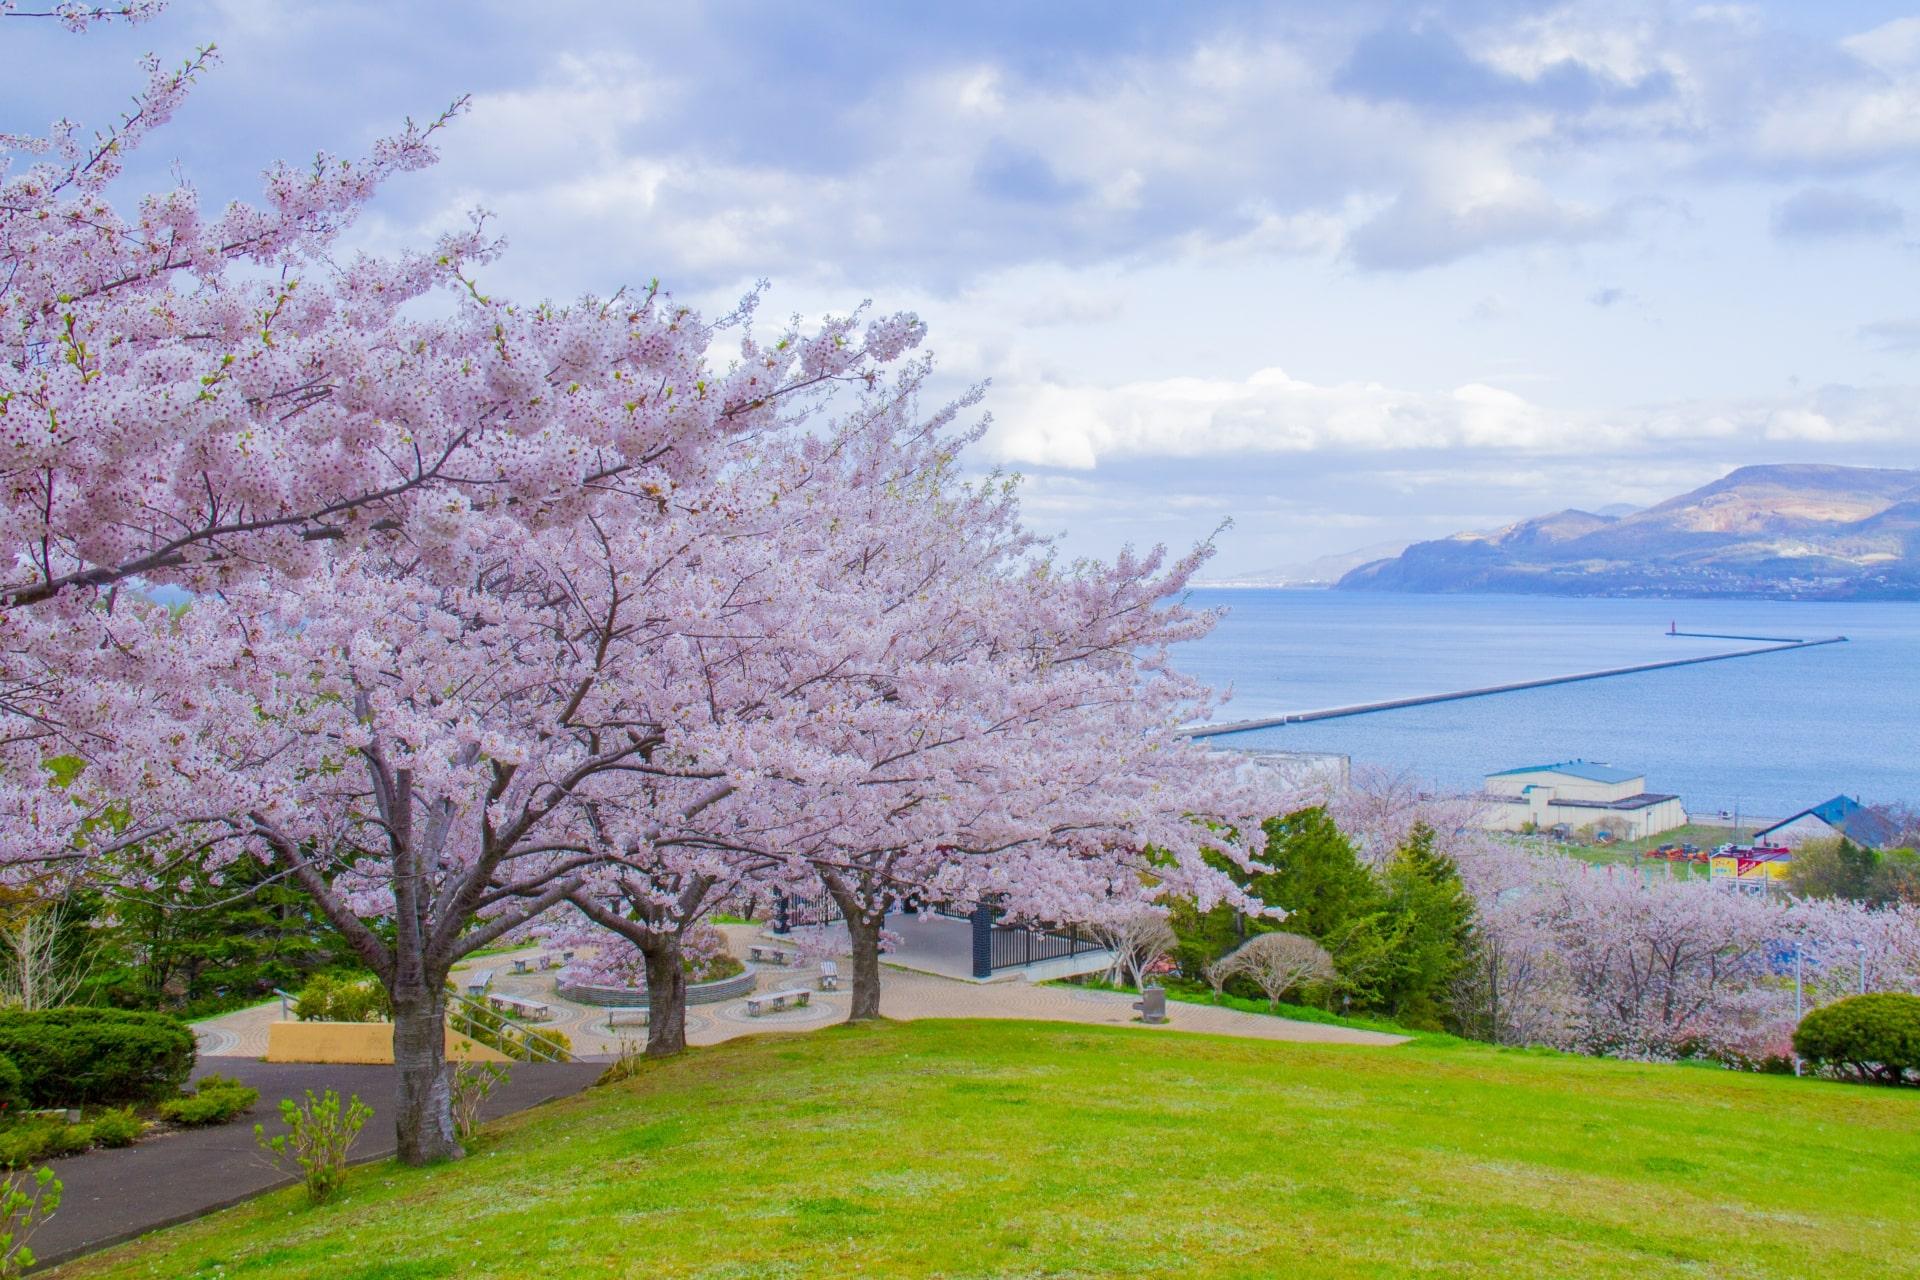 Best Cherry Blossom Spots in Hokkaido 2020